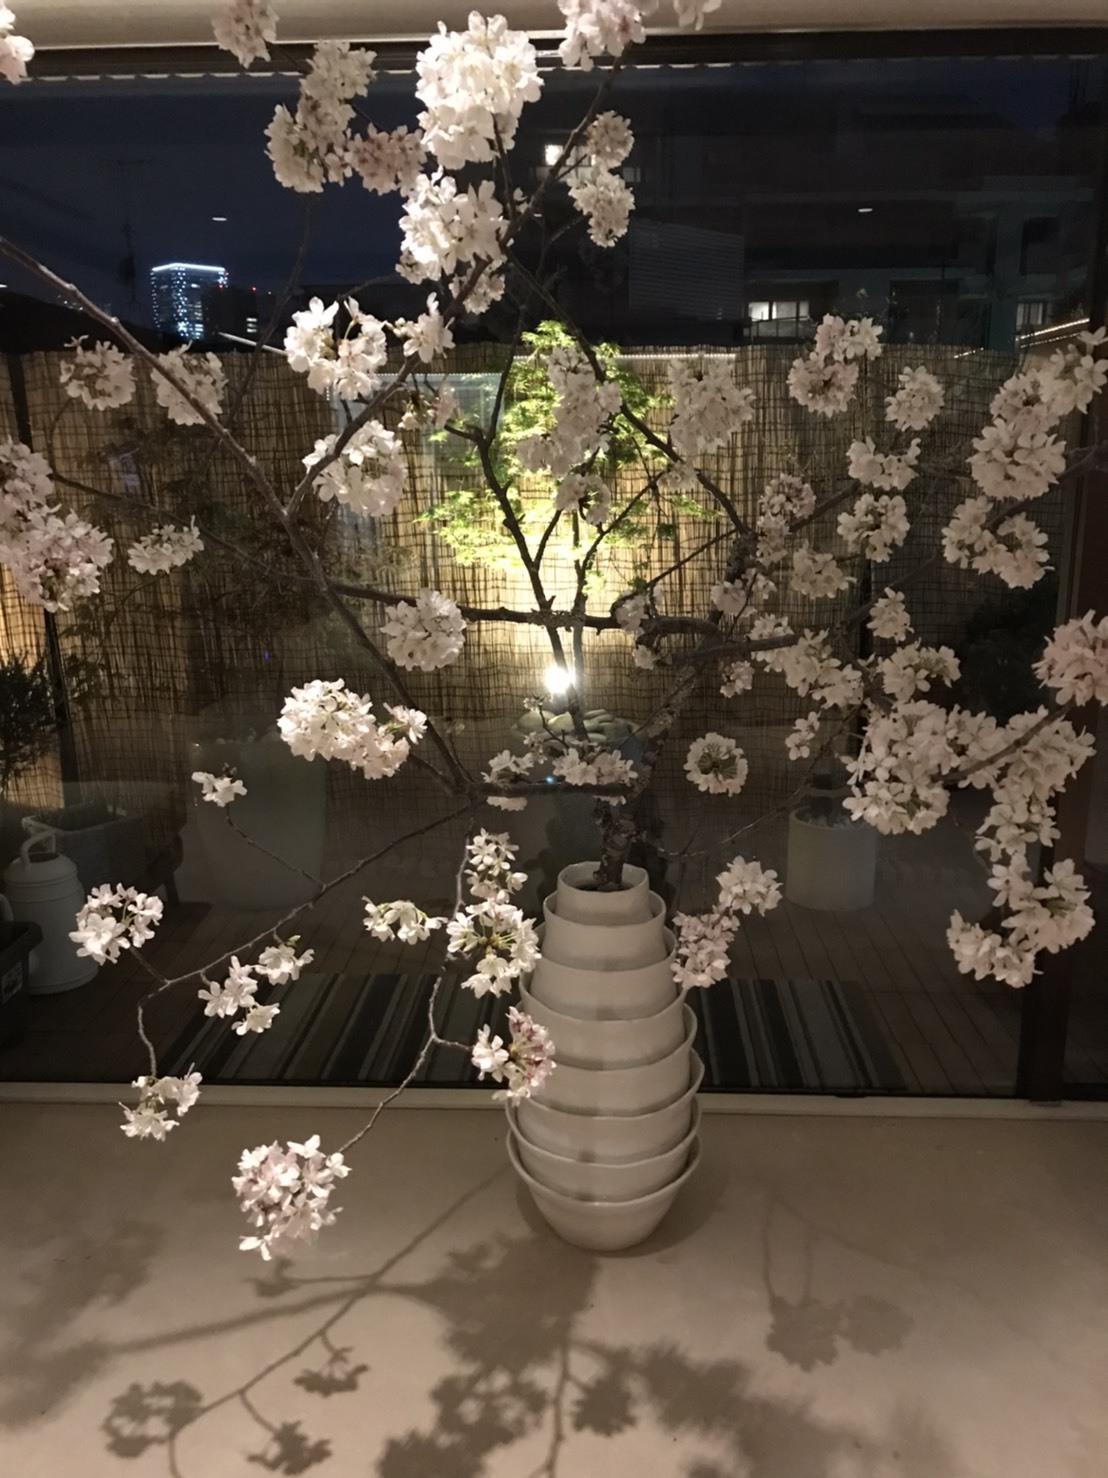 桜は満開♪_d0339889_19194346.jpg